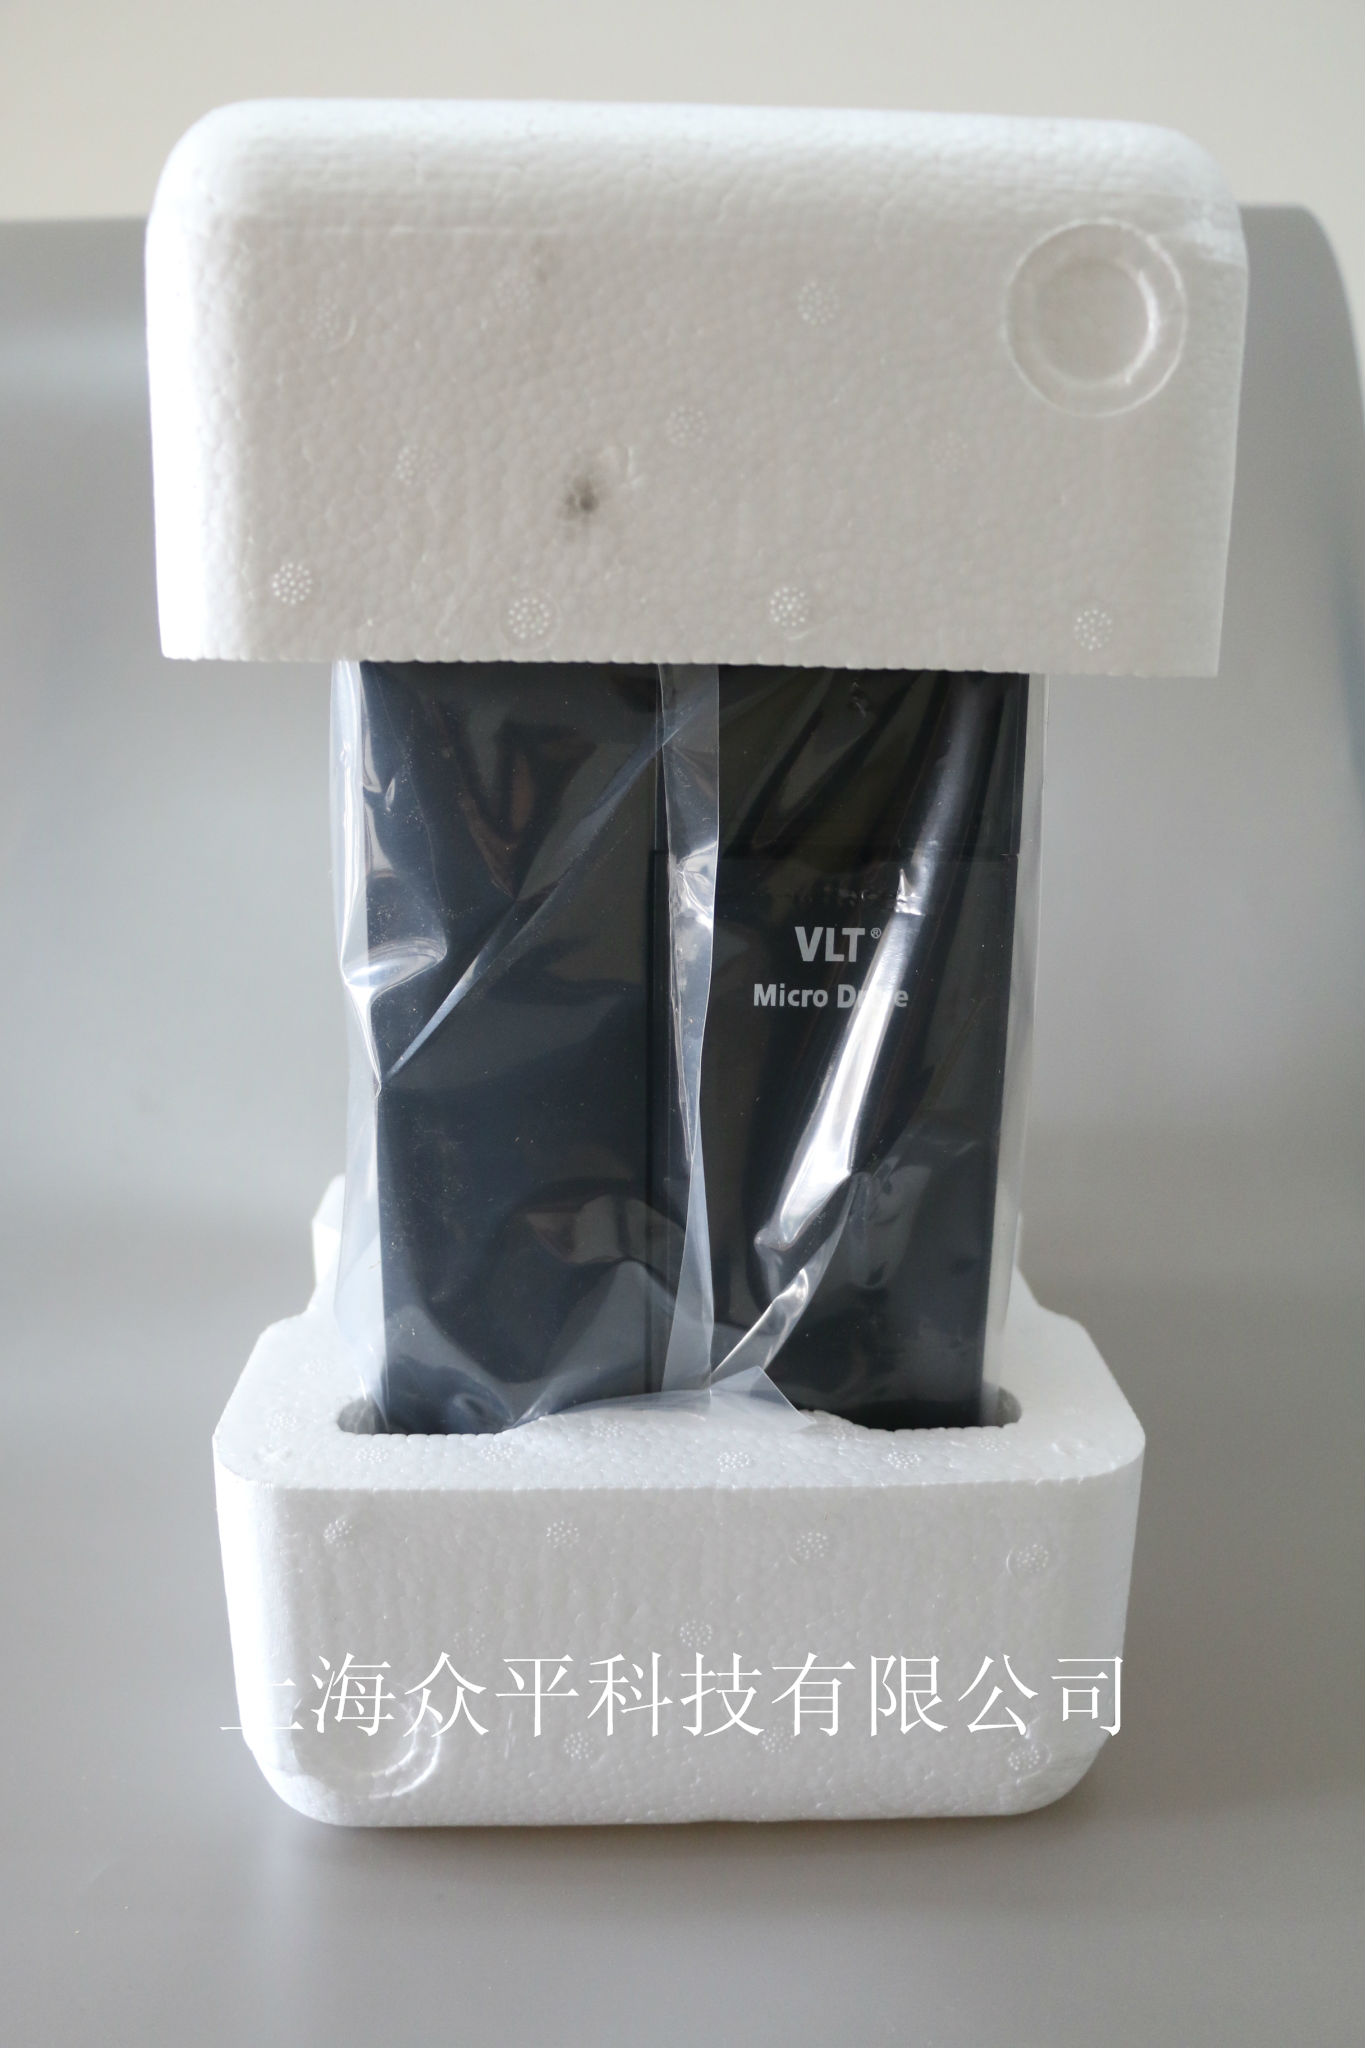 Danfoss convertidor trifásico 380-480V 5.5KWFC111P5K5T4E20H4XC